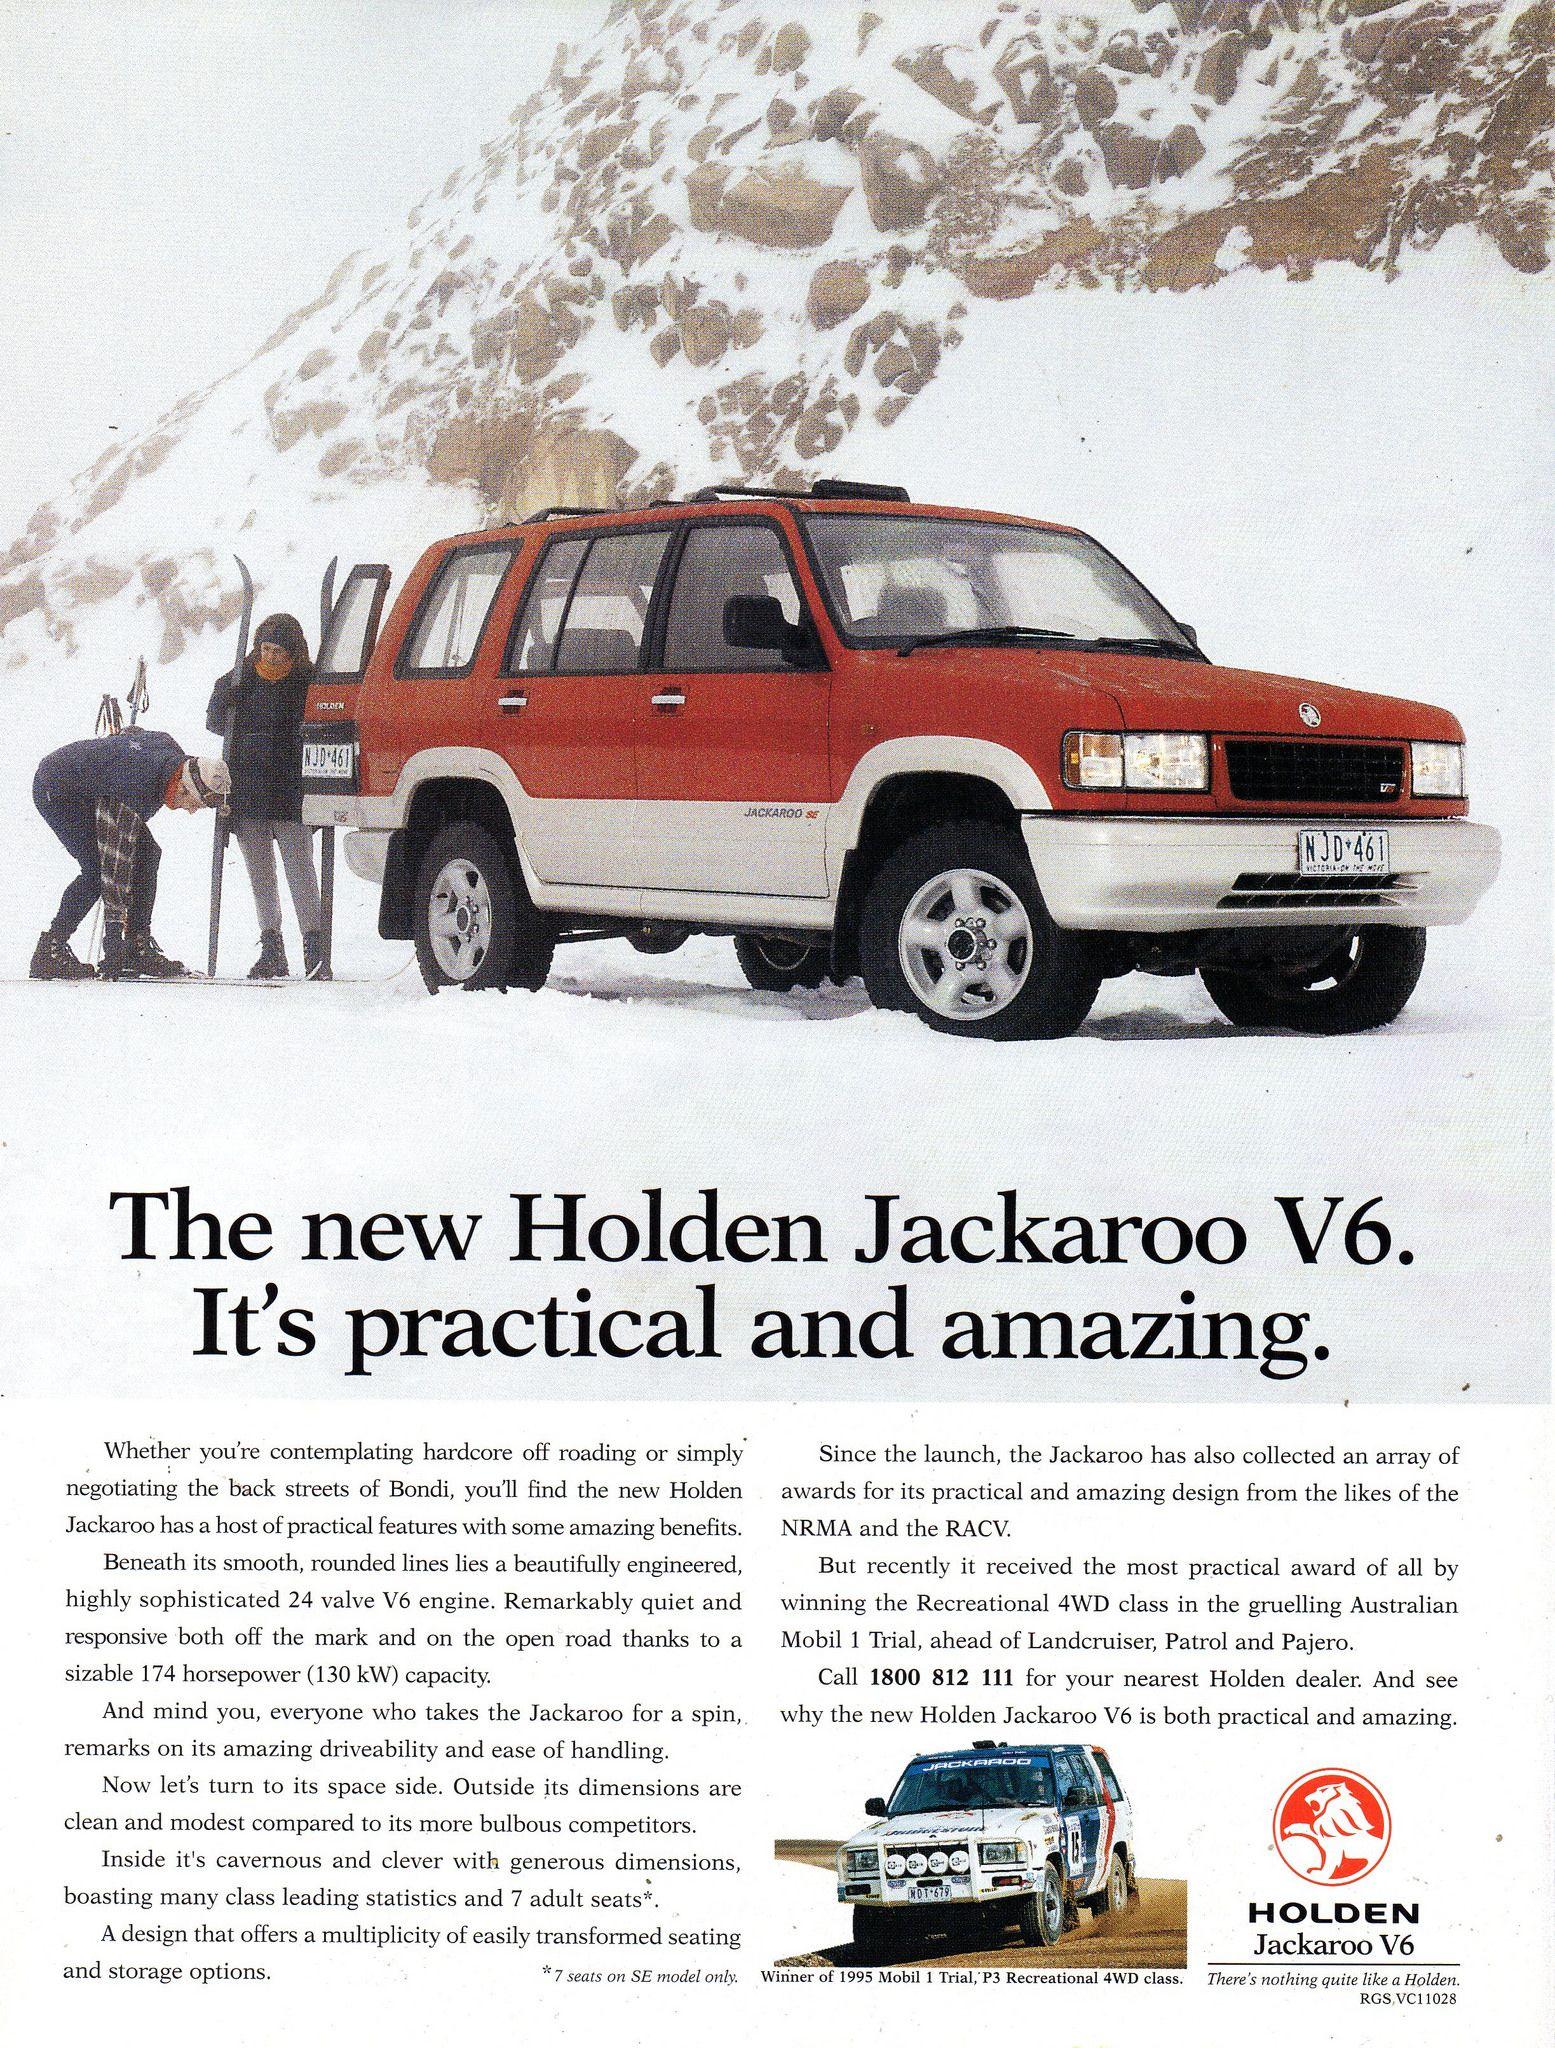 1995 Ubs 2 Holden Jackaroo V6 Suv Wagon Aussie Original Magazine Advertisement Holden Australia Car Ads Car